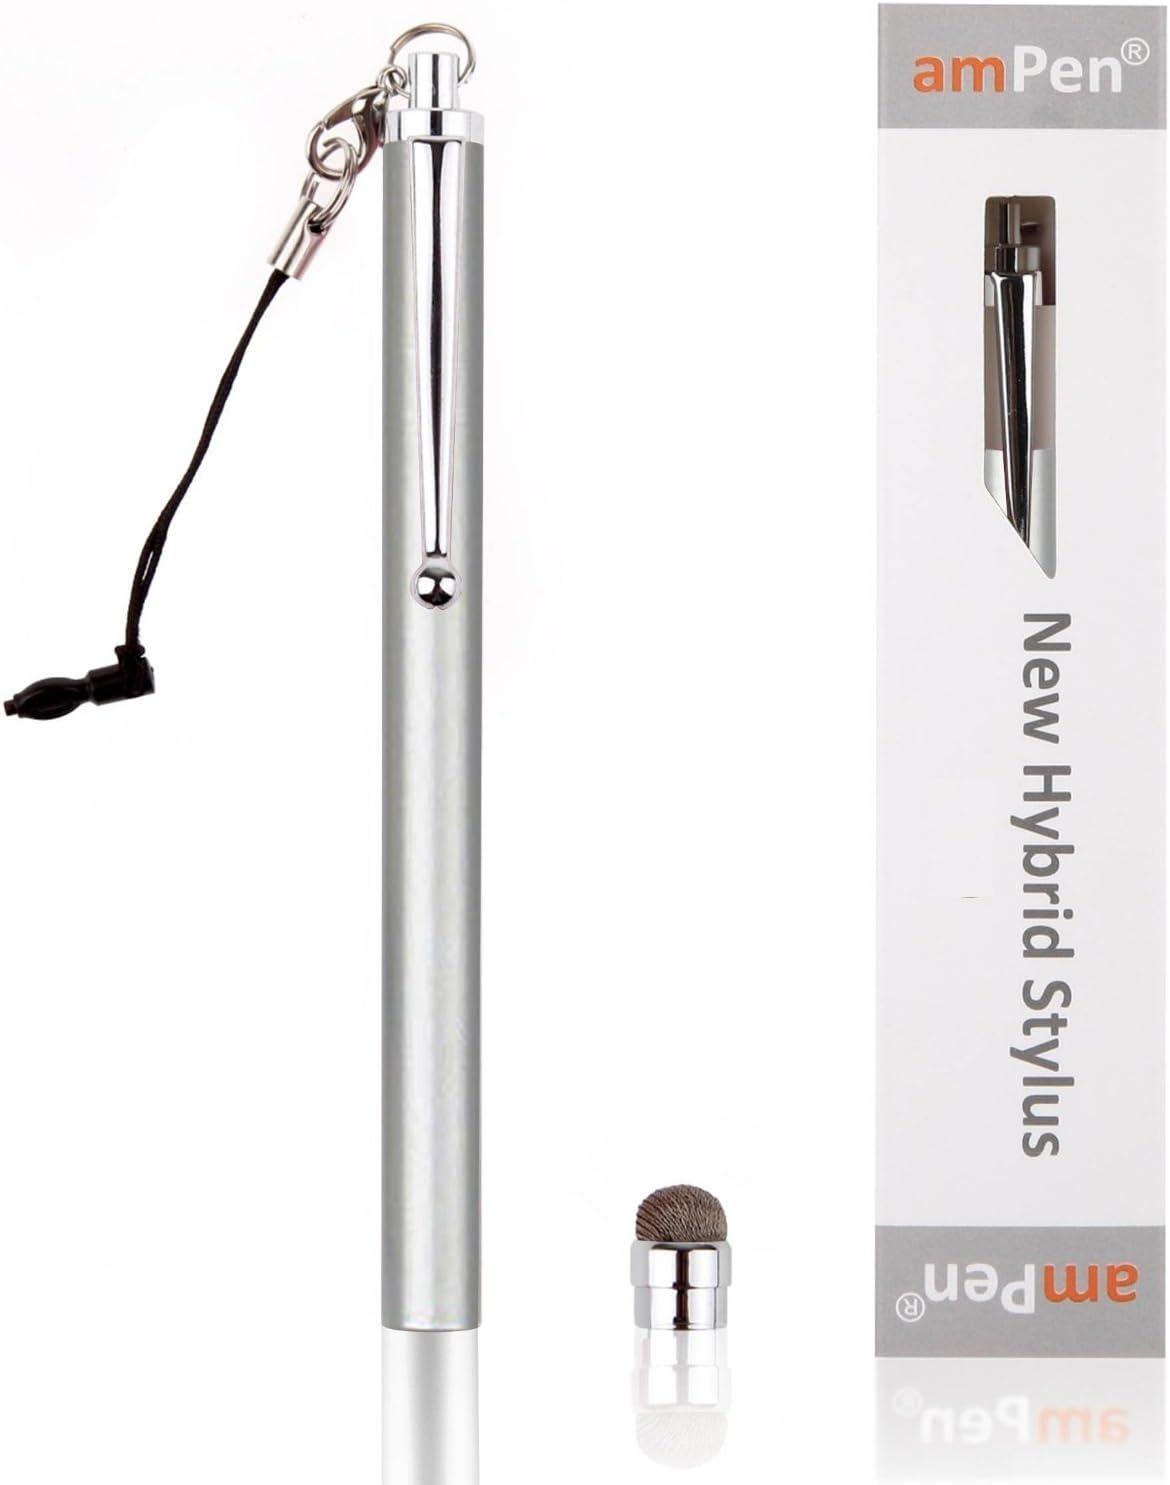 amPen Hybrid Stylus Pen - Interchangeable Hybrid Tip Touchscreen Stylus (Silver)